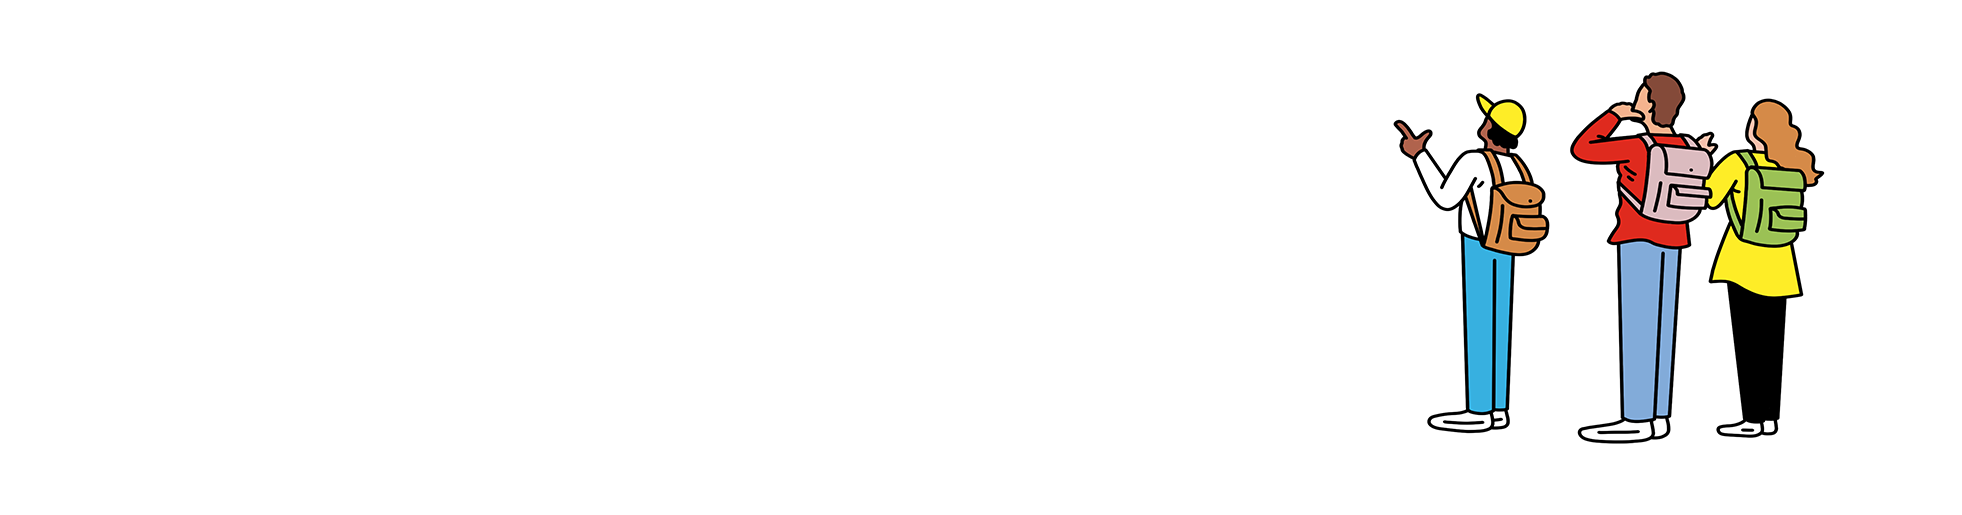 SLC2019-19.png